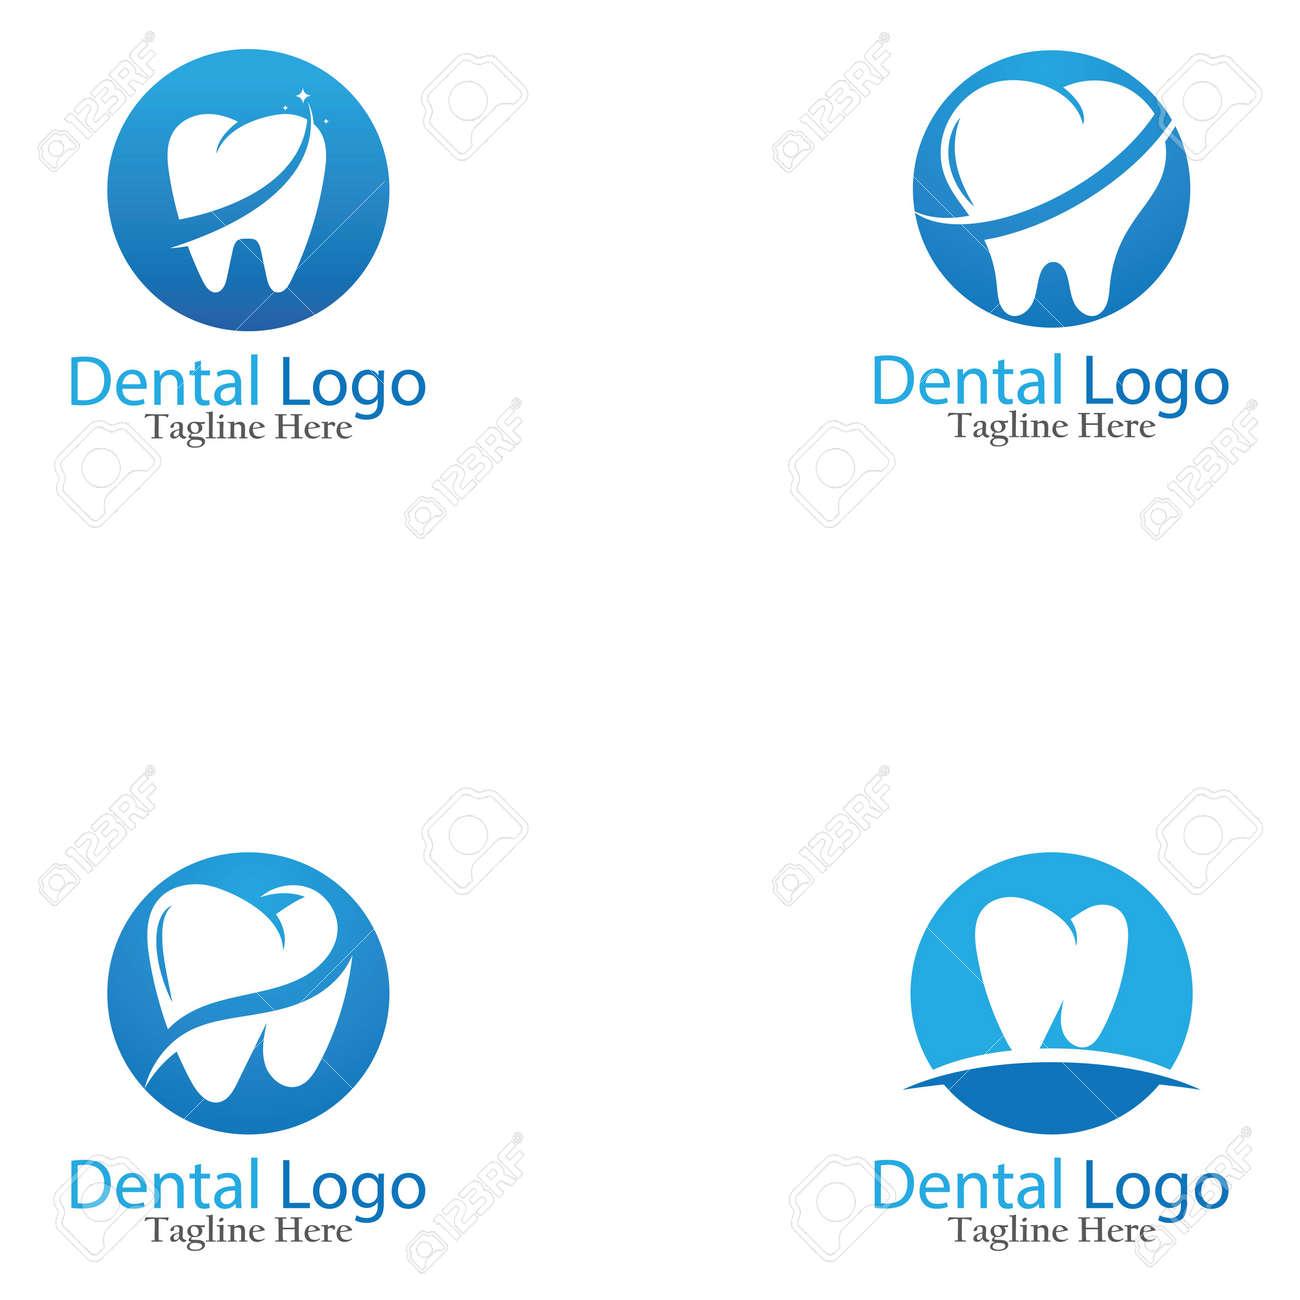 Dental logo and symbol - 154338686